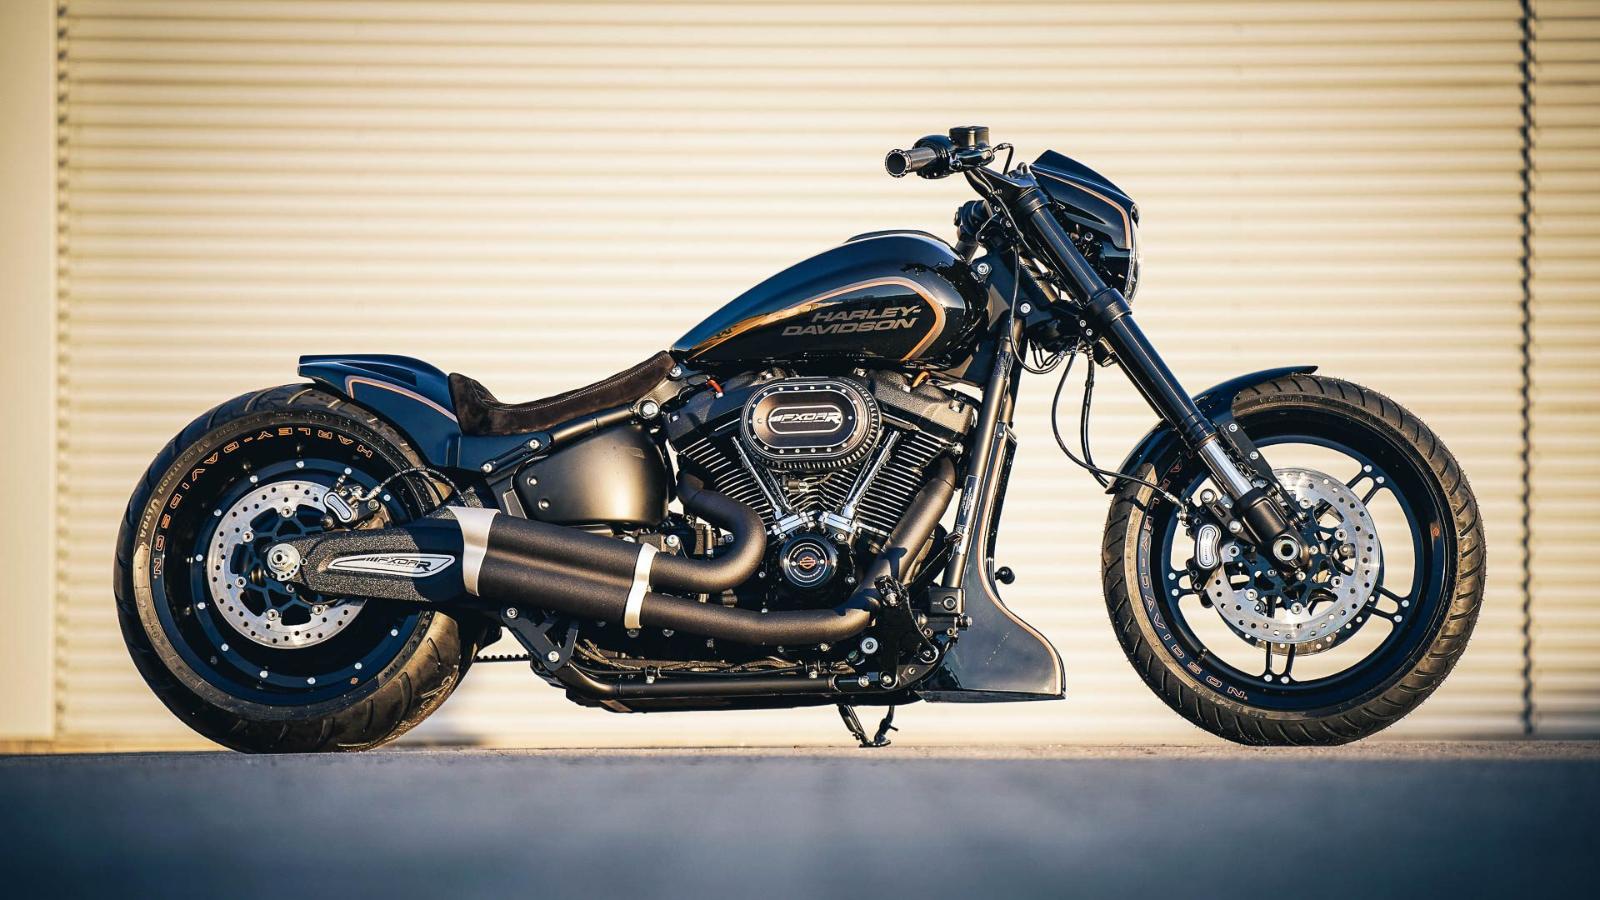 2019 FXDR 114 Customized by Thunderbike